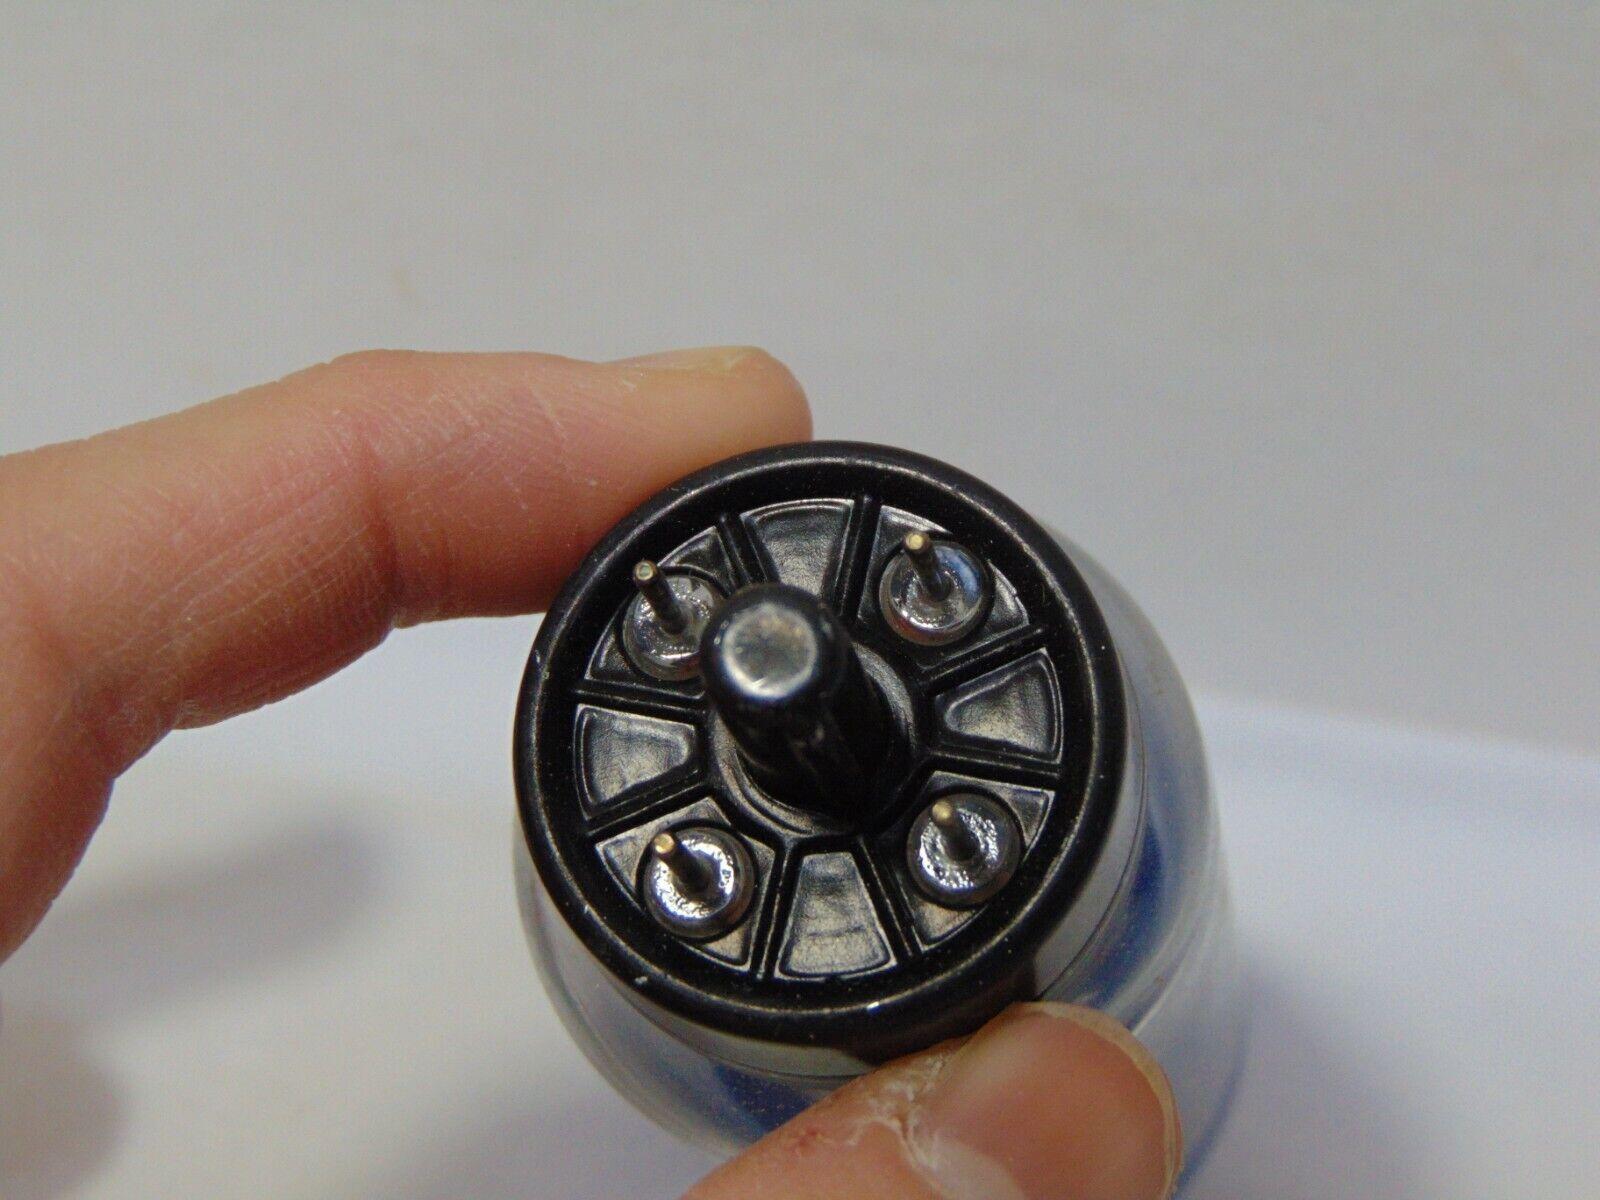 Westingouse Projection Lamp 1000W DPW-125V